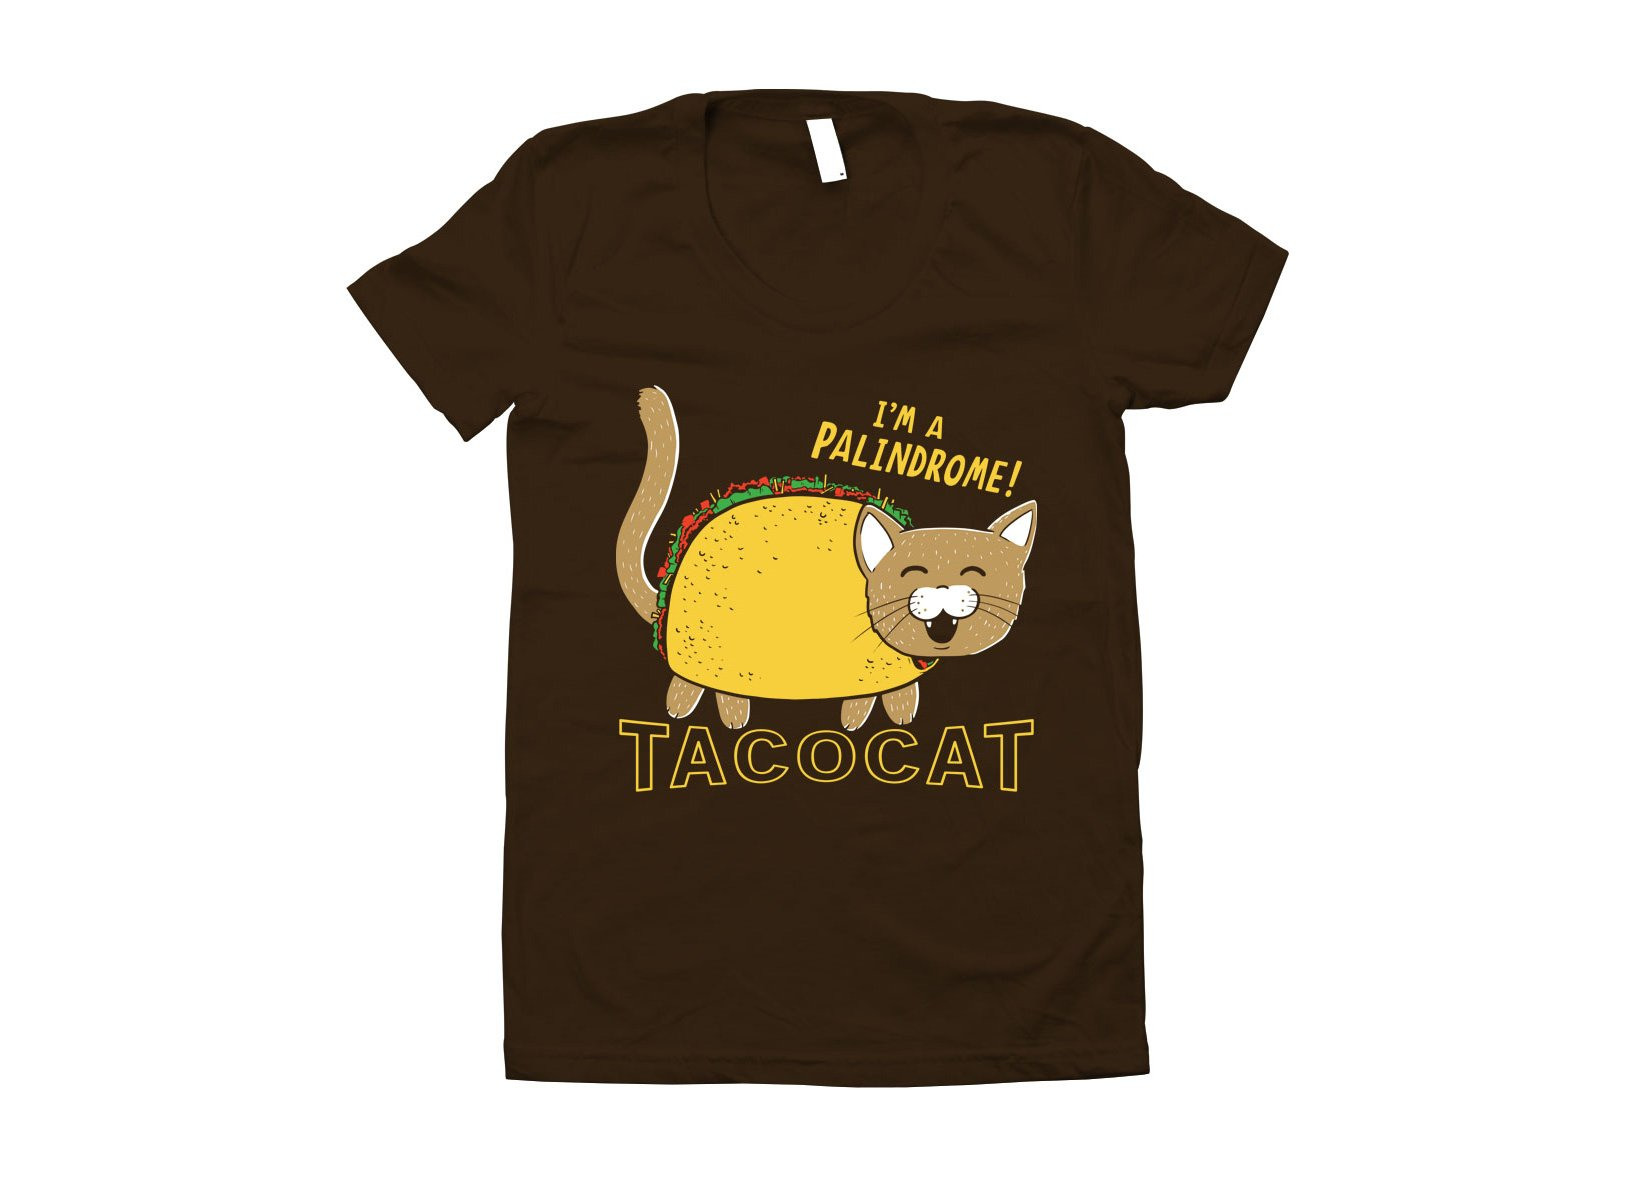 Taco Cat on Juniors T-Shirt